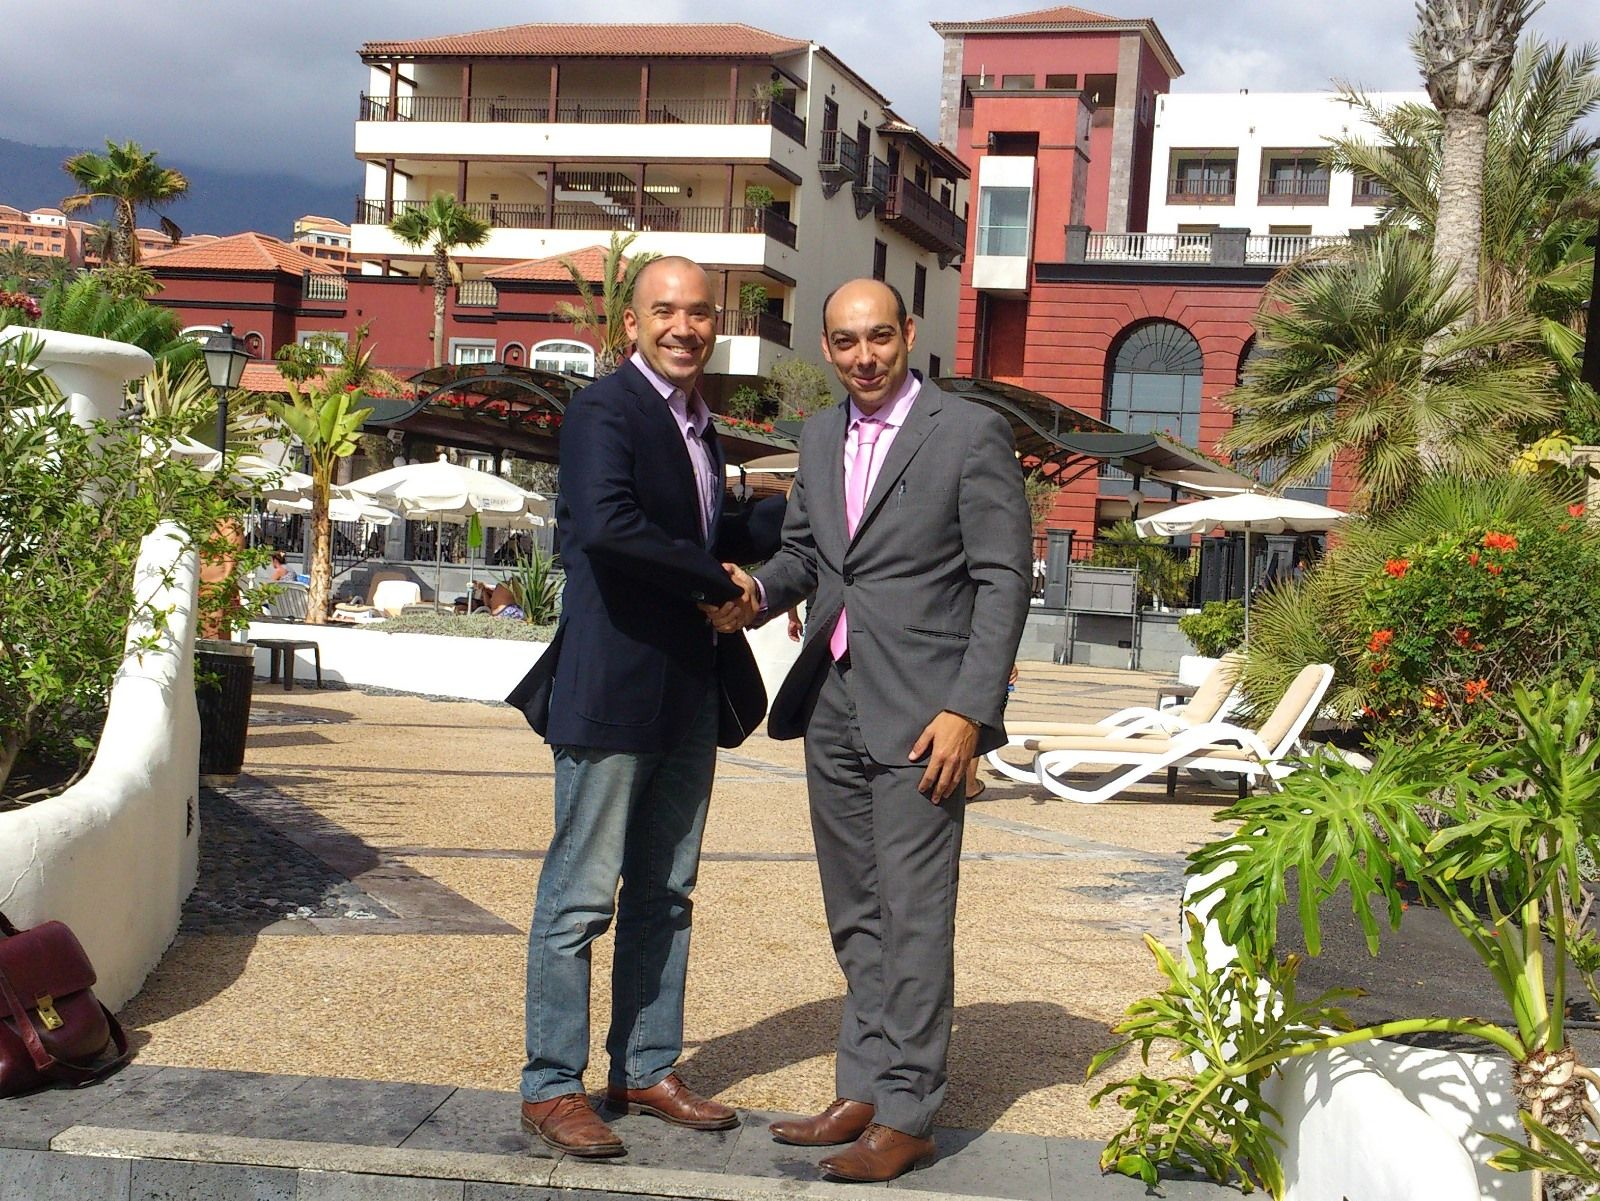 Dreamplace Hotels & Resorts escoje el sistema coaxial de WiFi Mundo